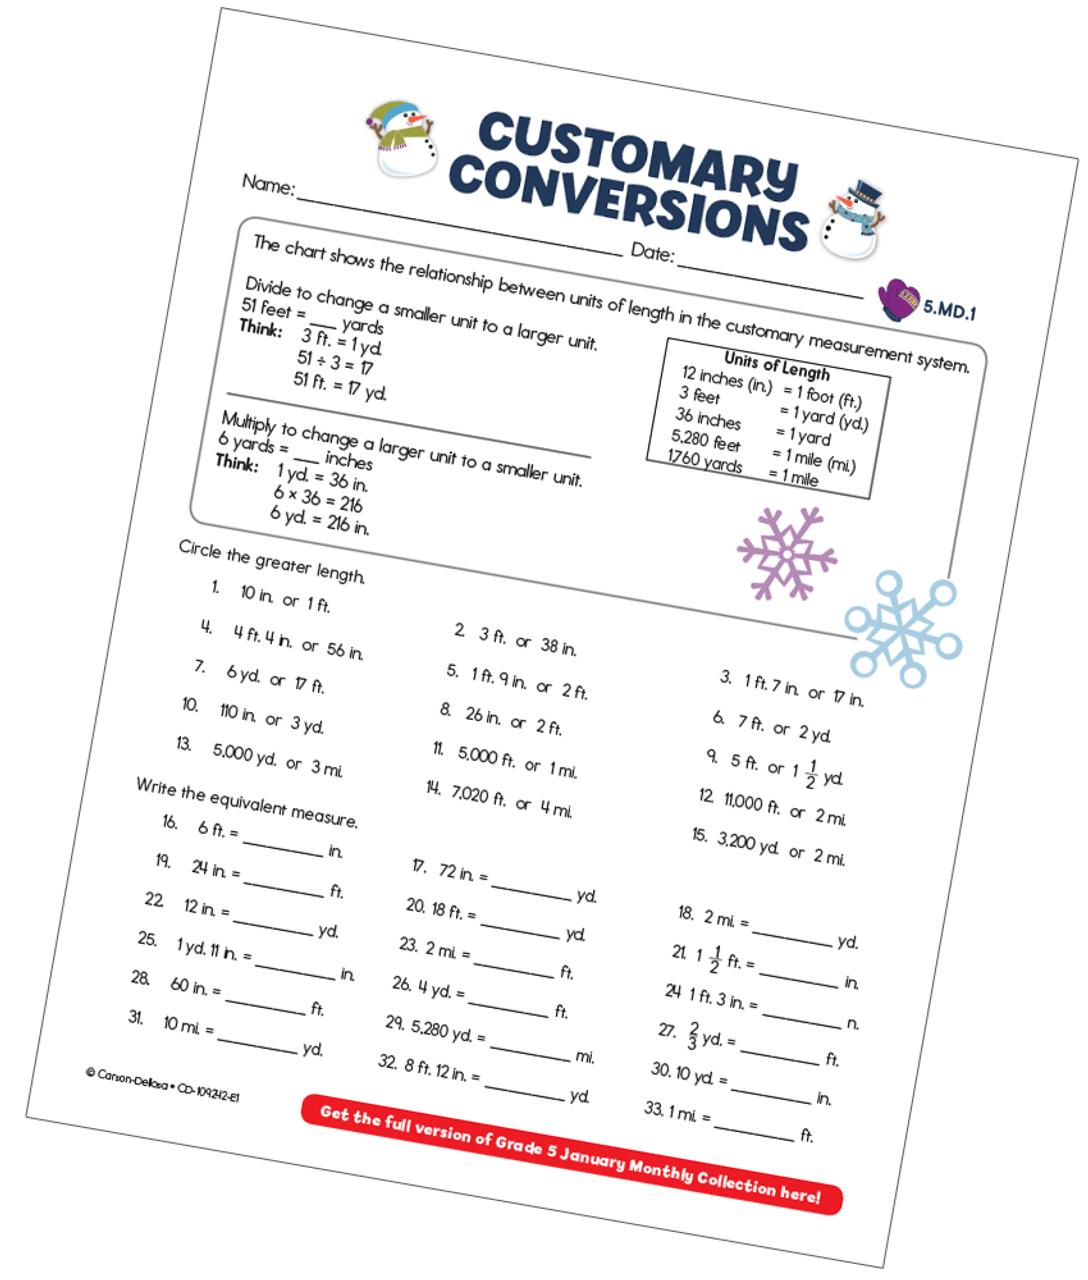 Customary Conversions (Measurement) Free Printable - Carson Dellosa  Education [ 1280 x 1088 Pixel ]